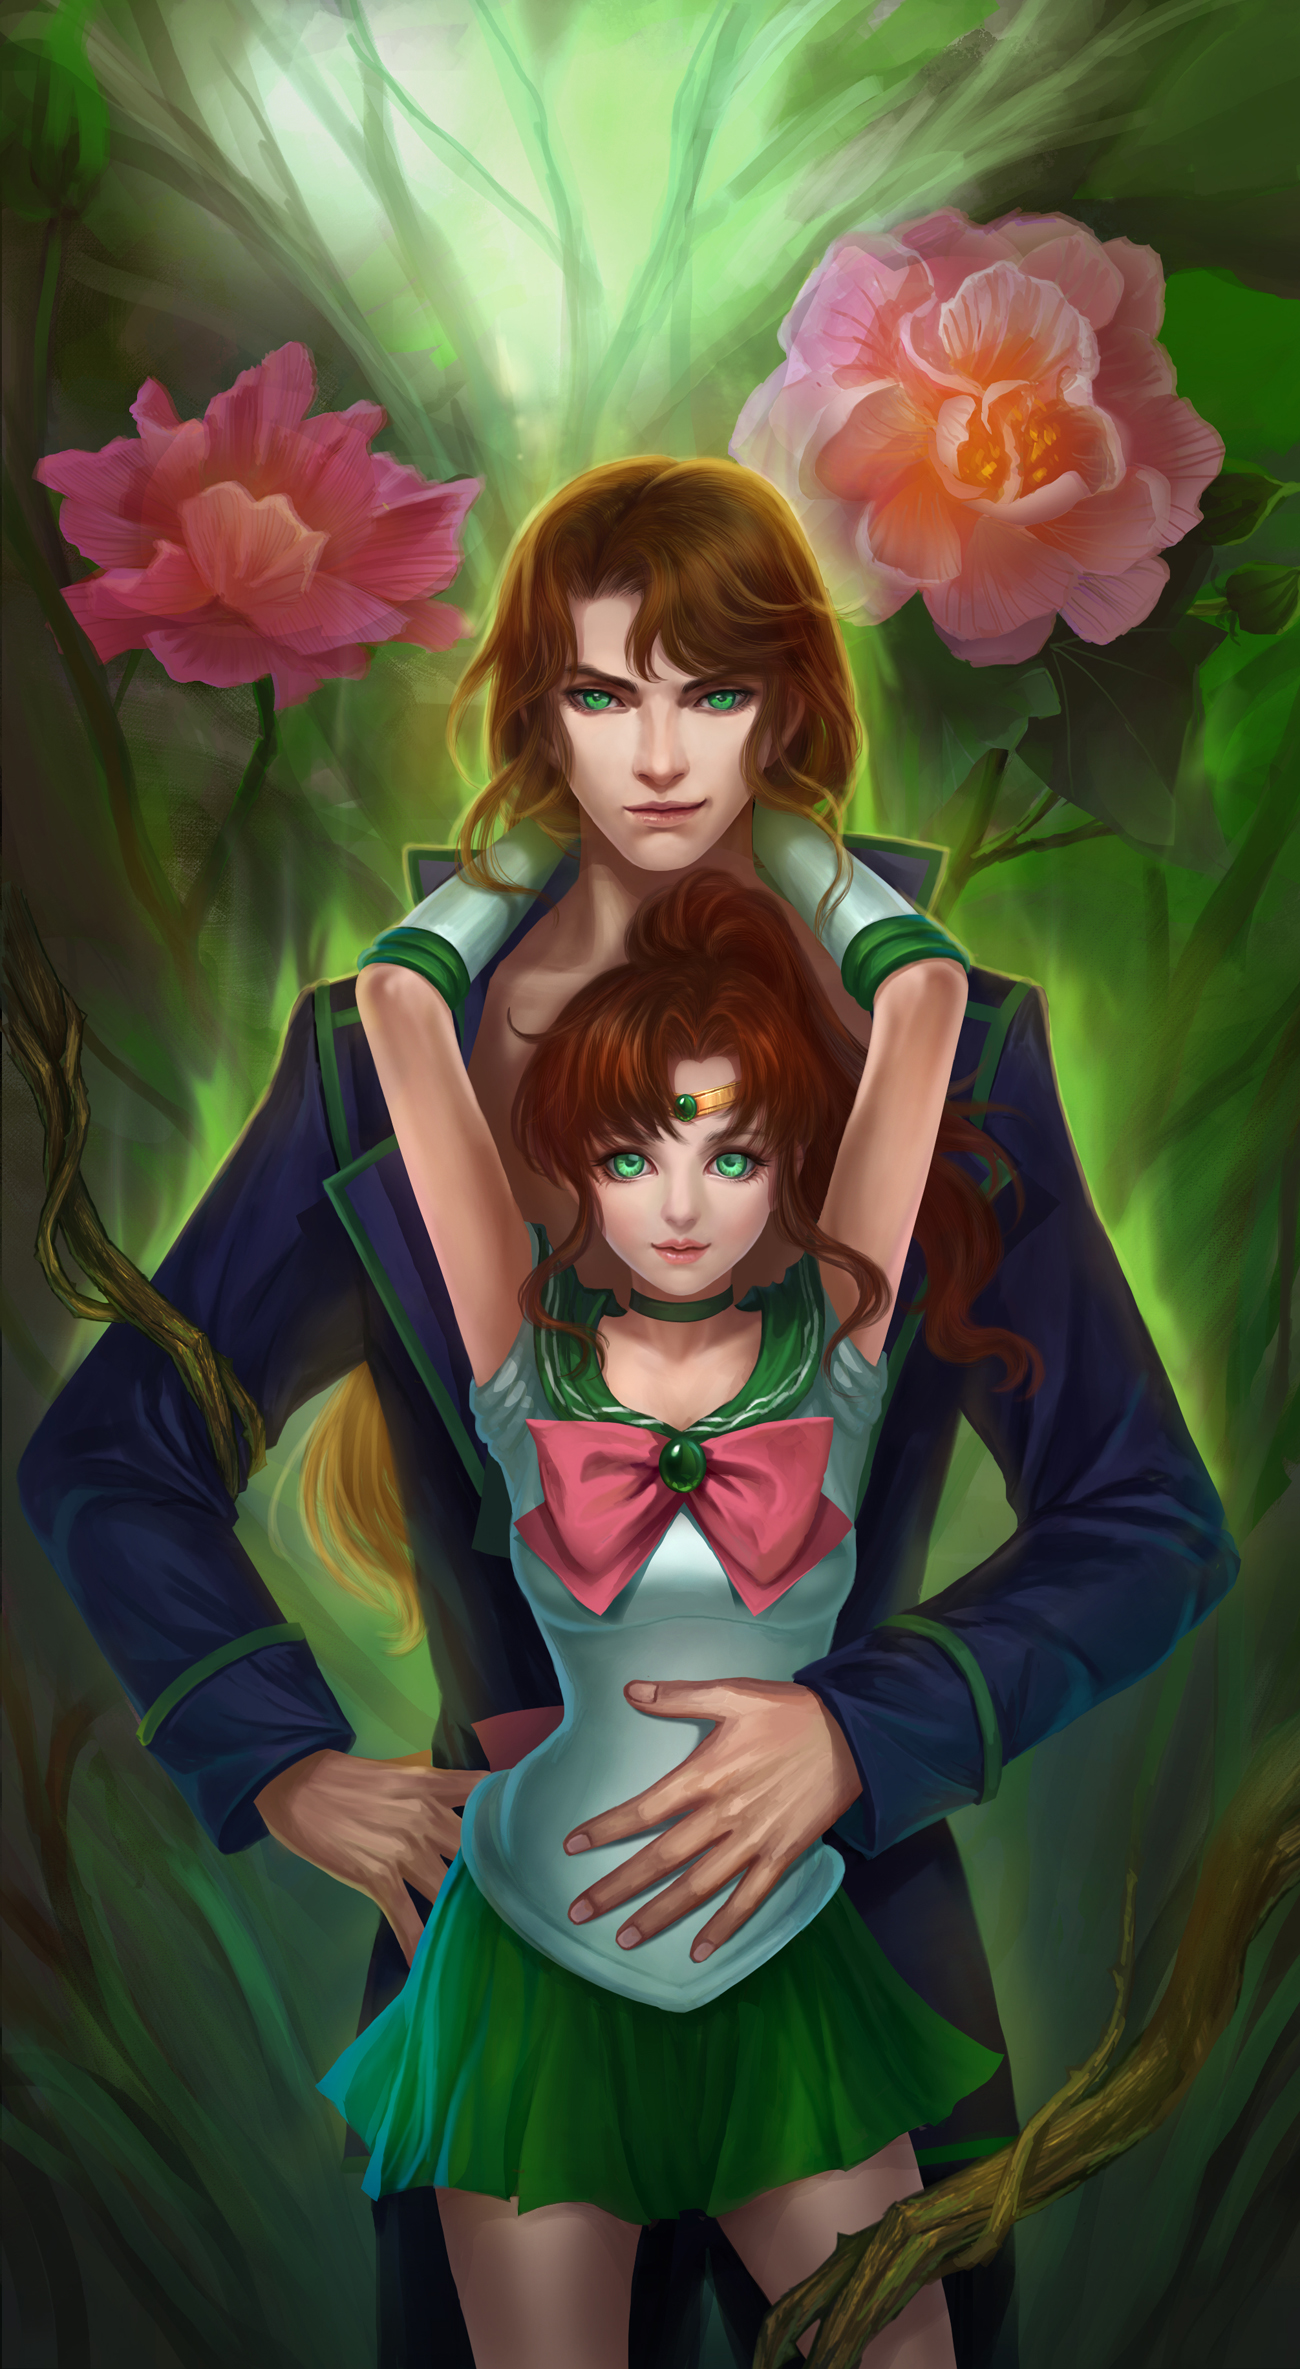 Bishoujo Senshi Sailor Moon (Pretty Guardian Sailor Moon